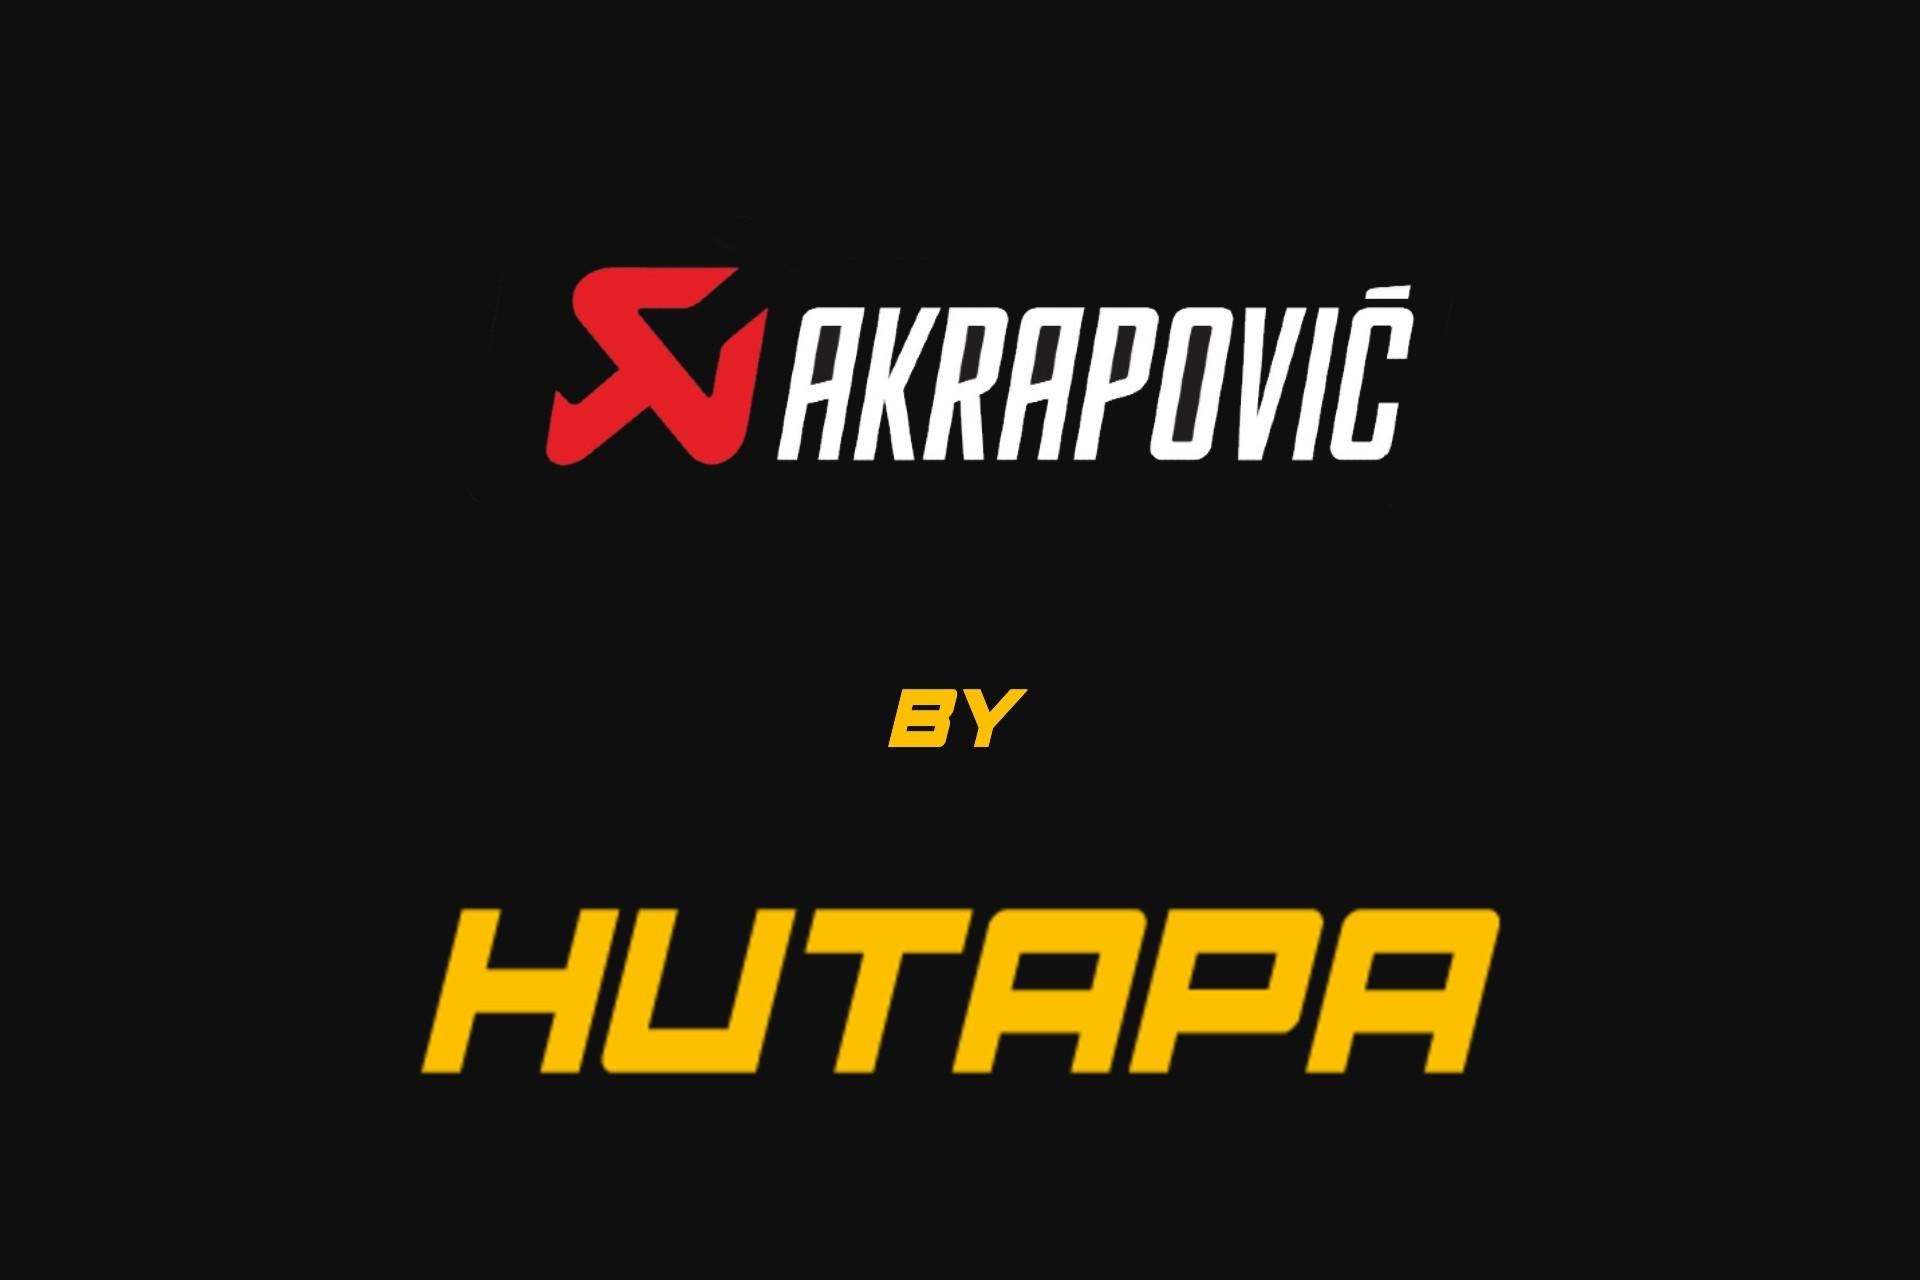 Akrapovic - Autogarage Hutapa